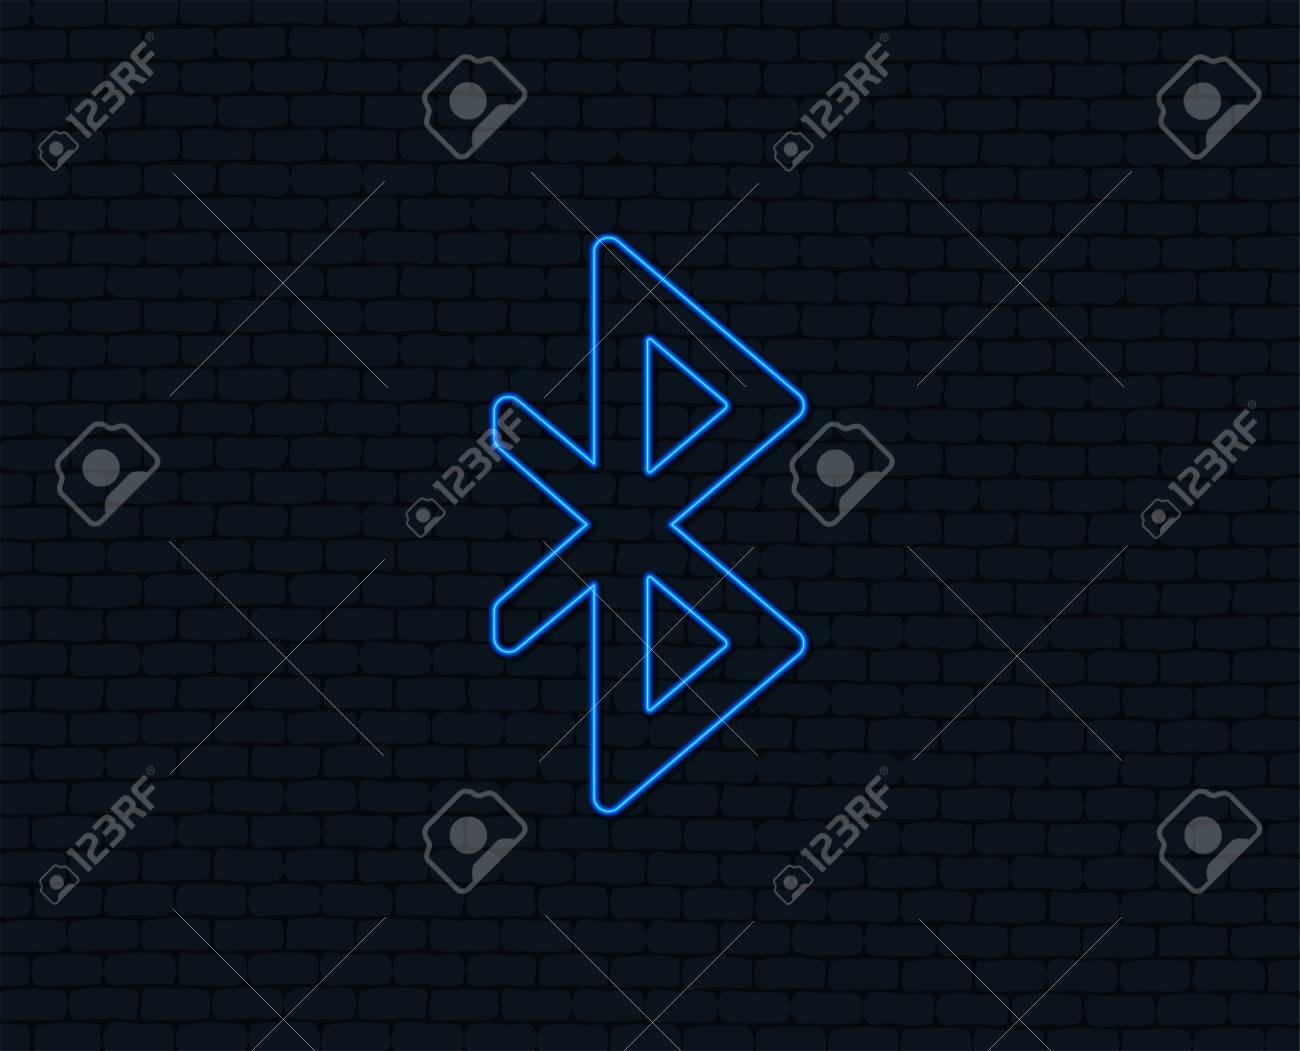 Neon Light Bluetooth Sign Icon Mobile Network Symbol Data